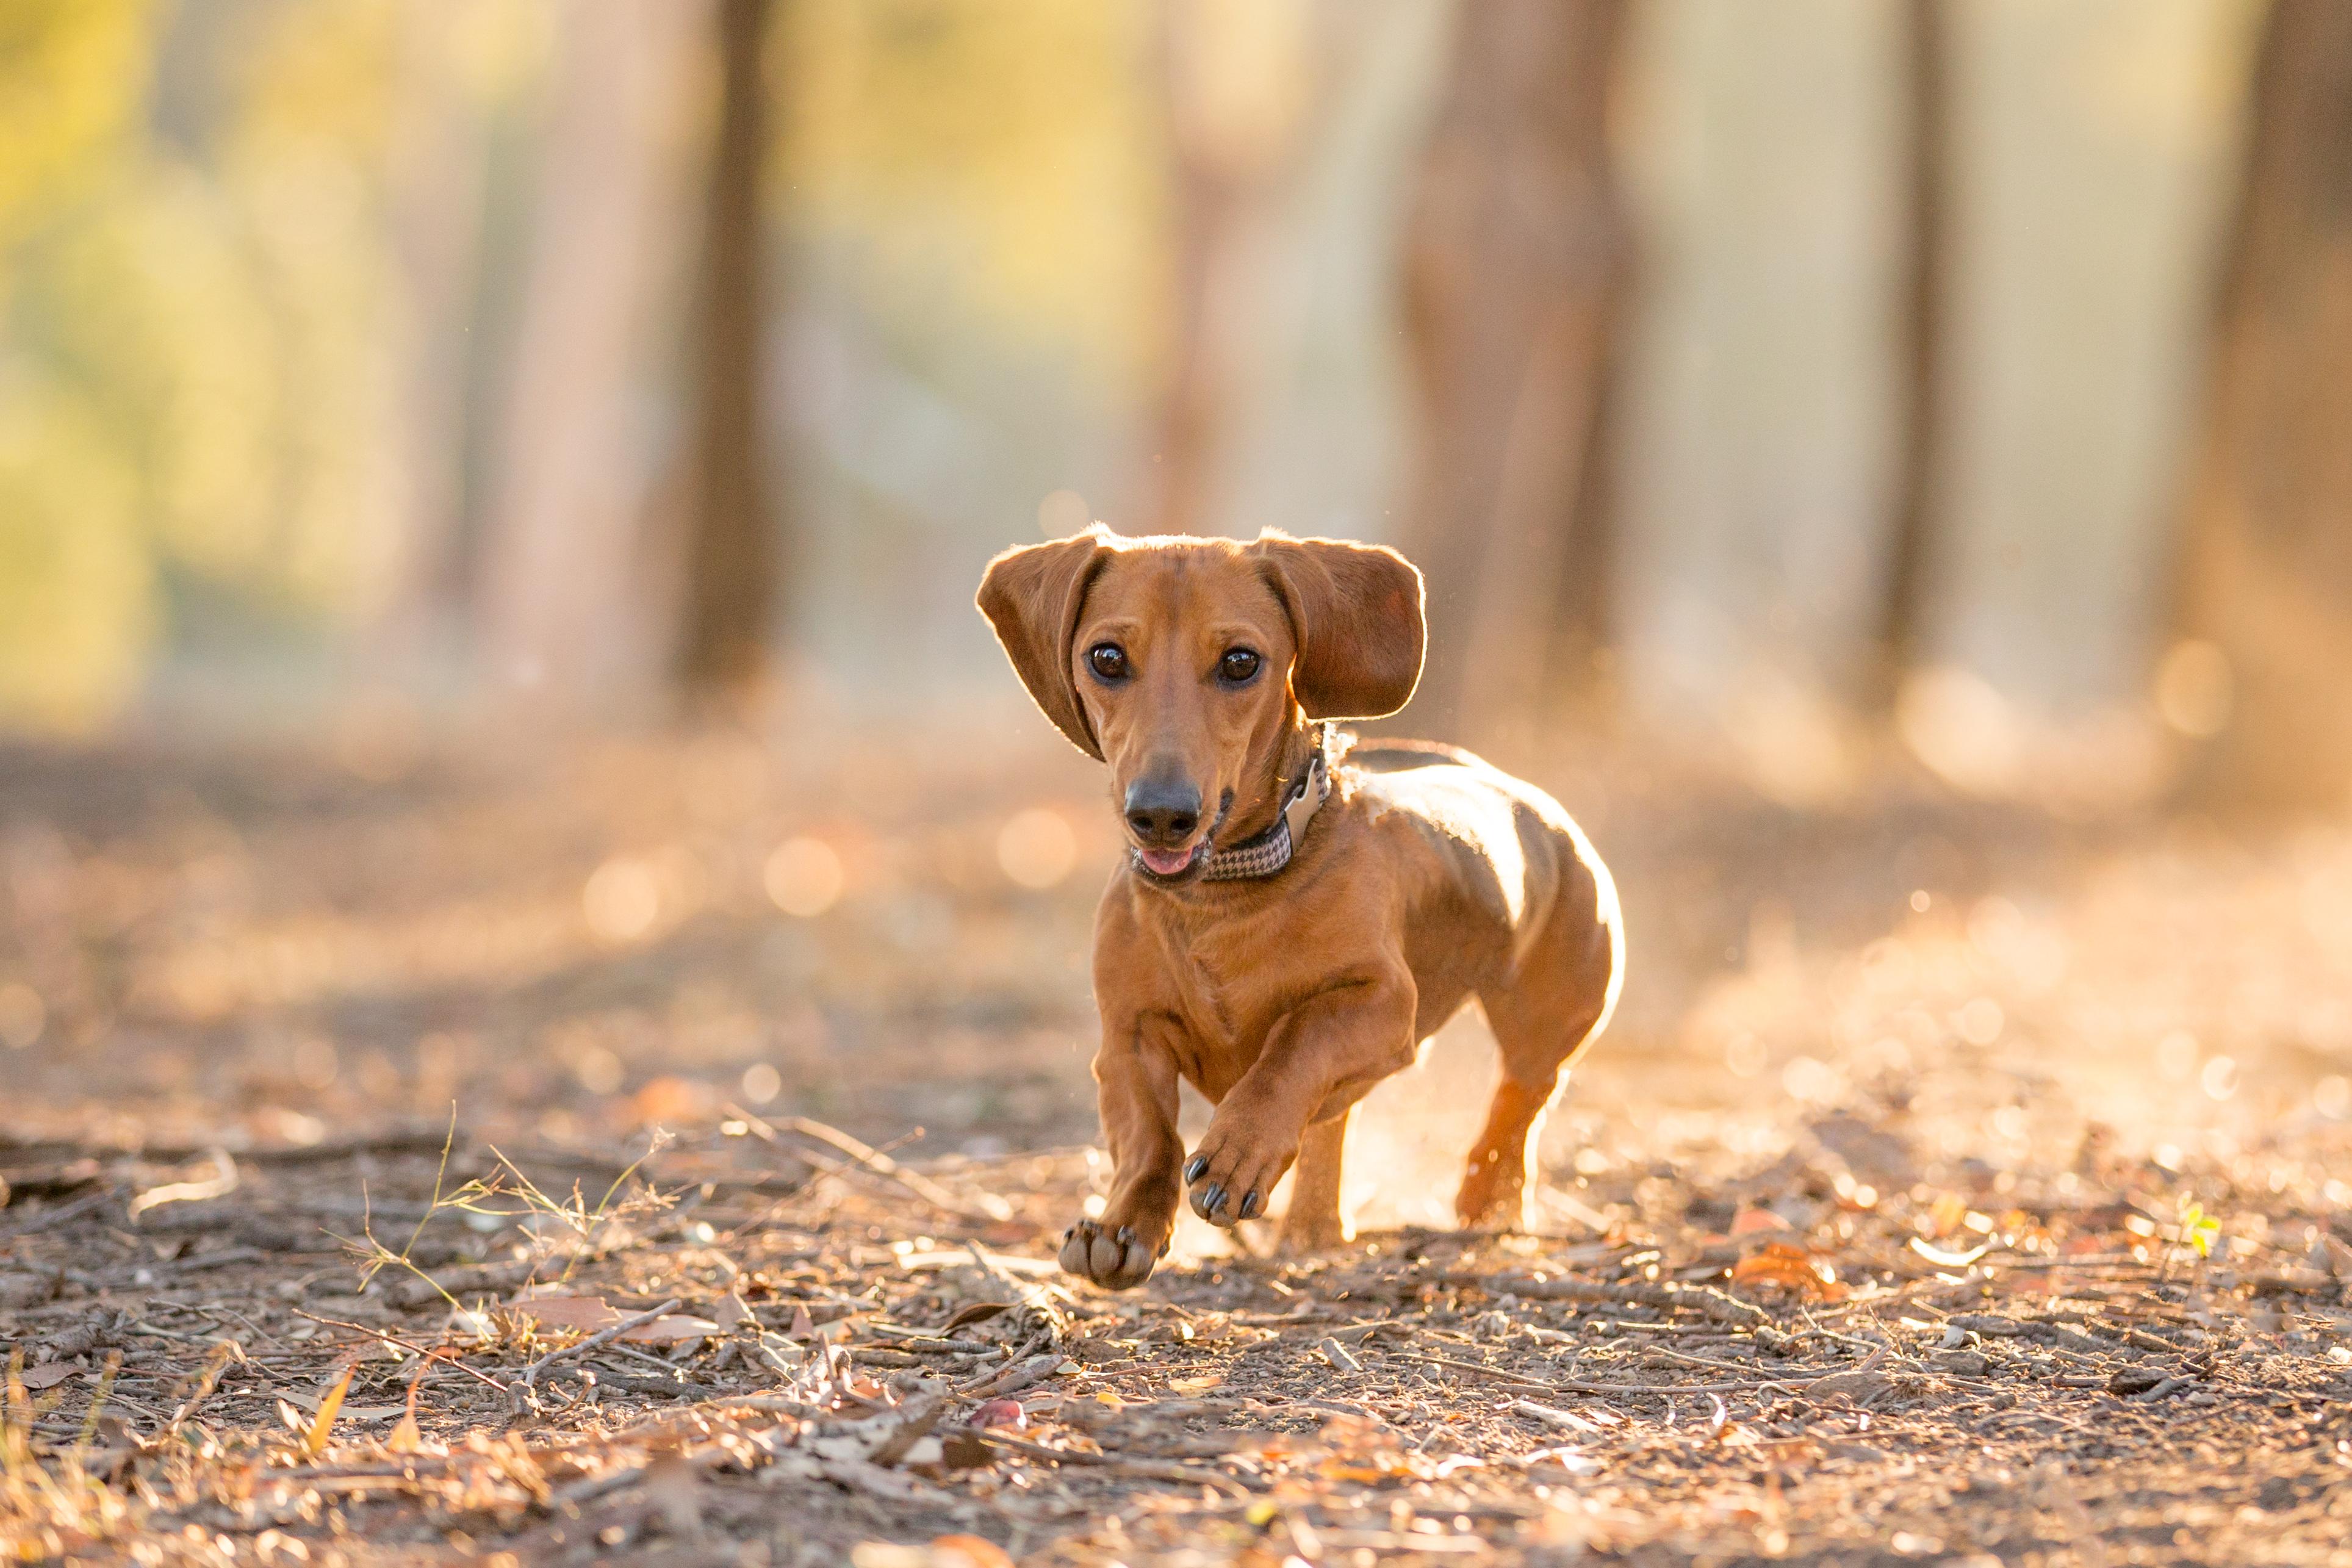 chermside dog photo studio